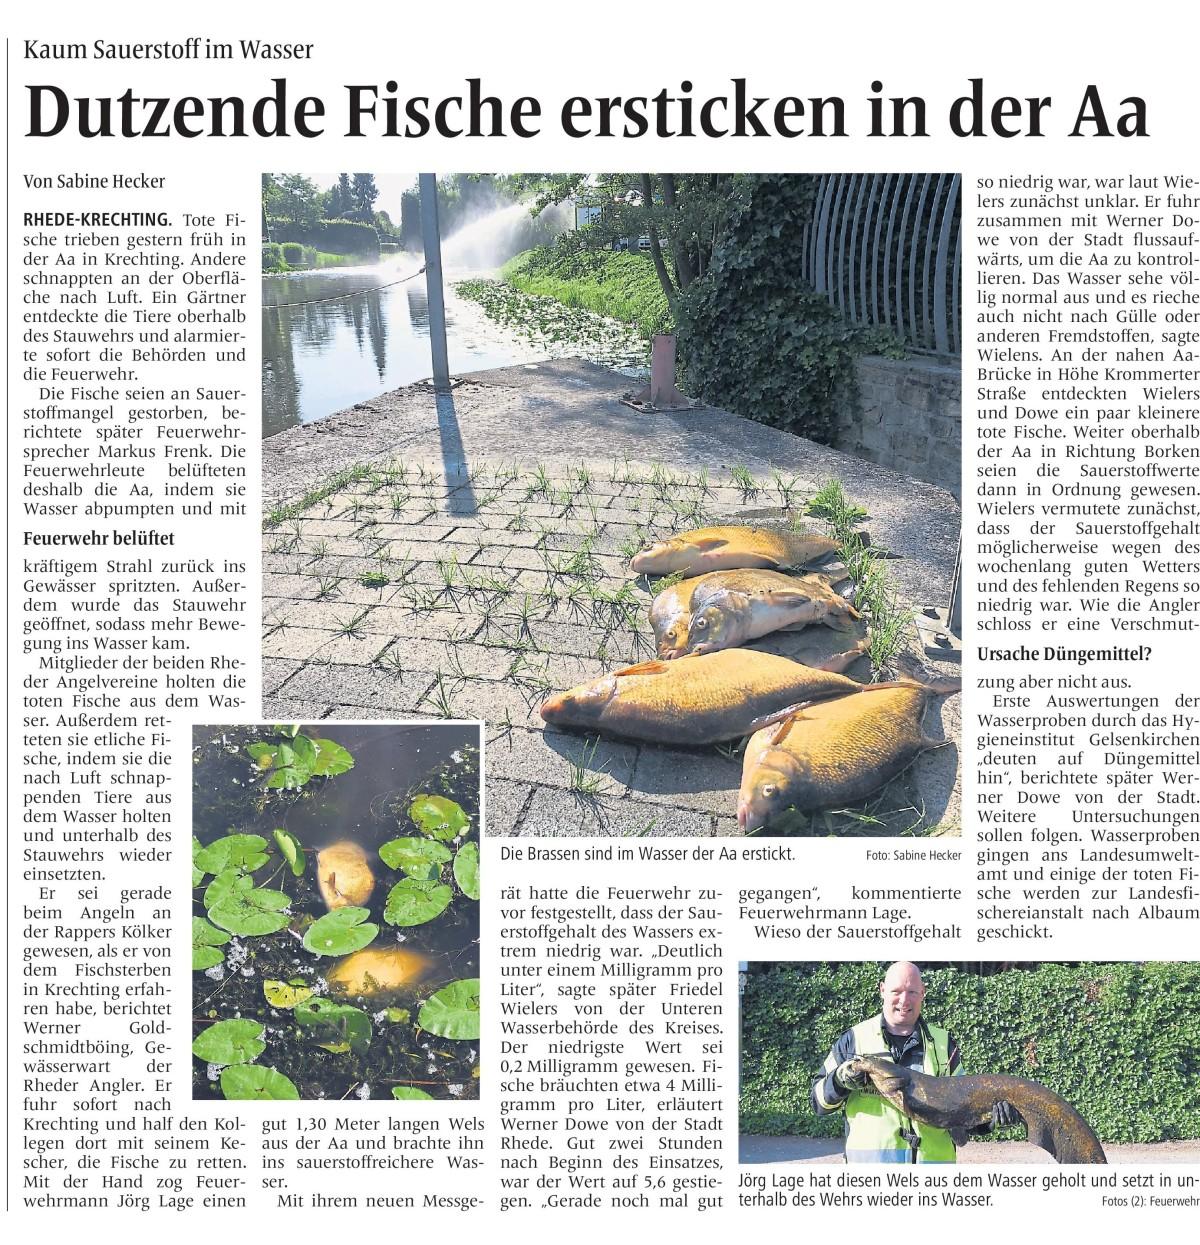 BBV 15 06 2018_Fischsterben Aa Rhede.jpg